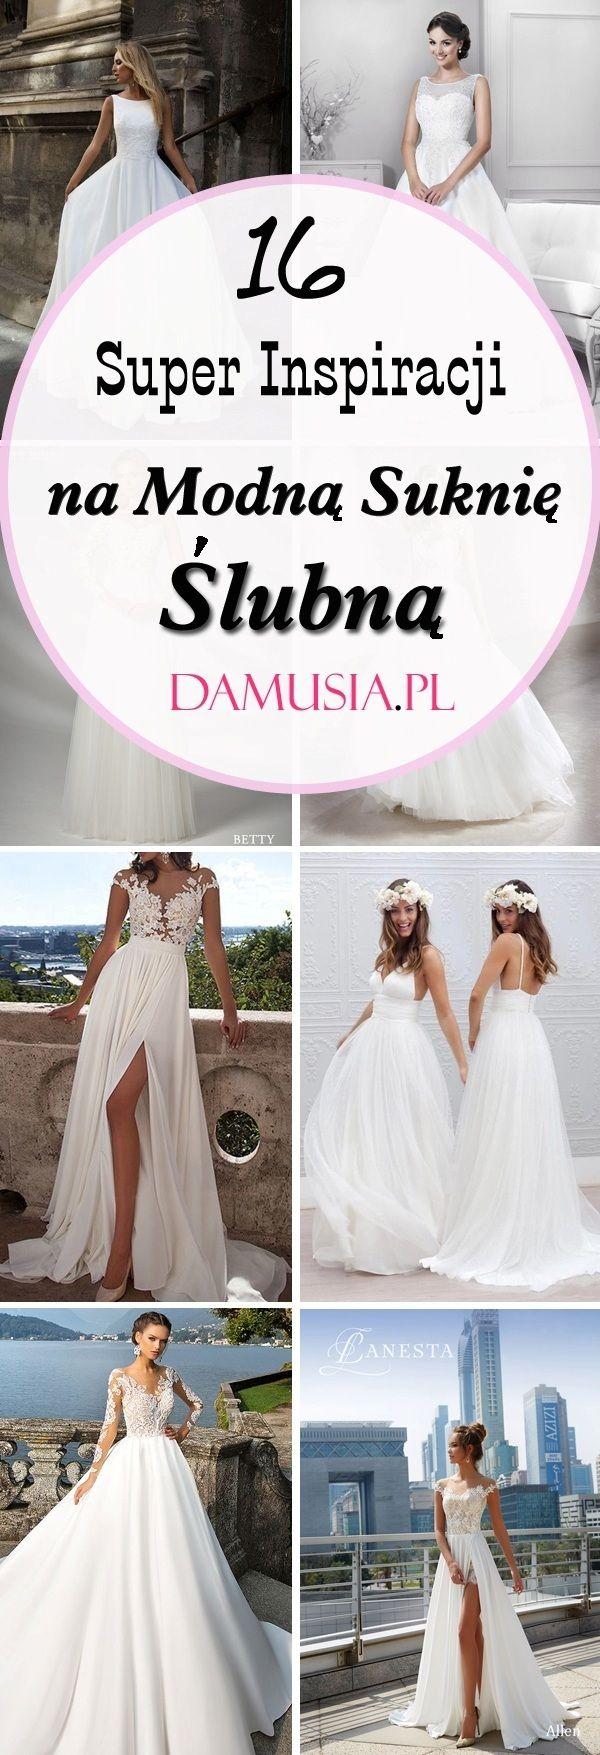 16 Super Inspiracji Na Modna Suknie Slubna Wedding Dresses Lace Wedding Dresses Dresses